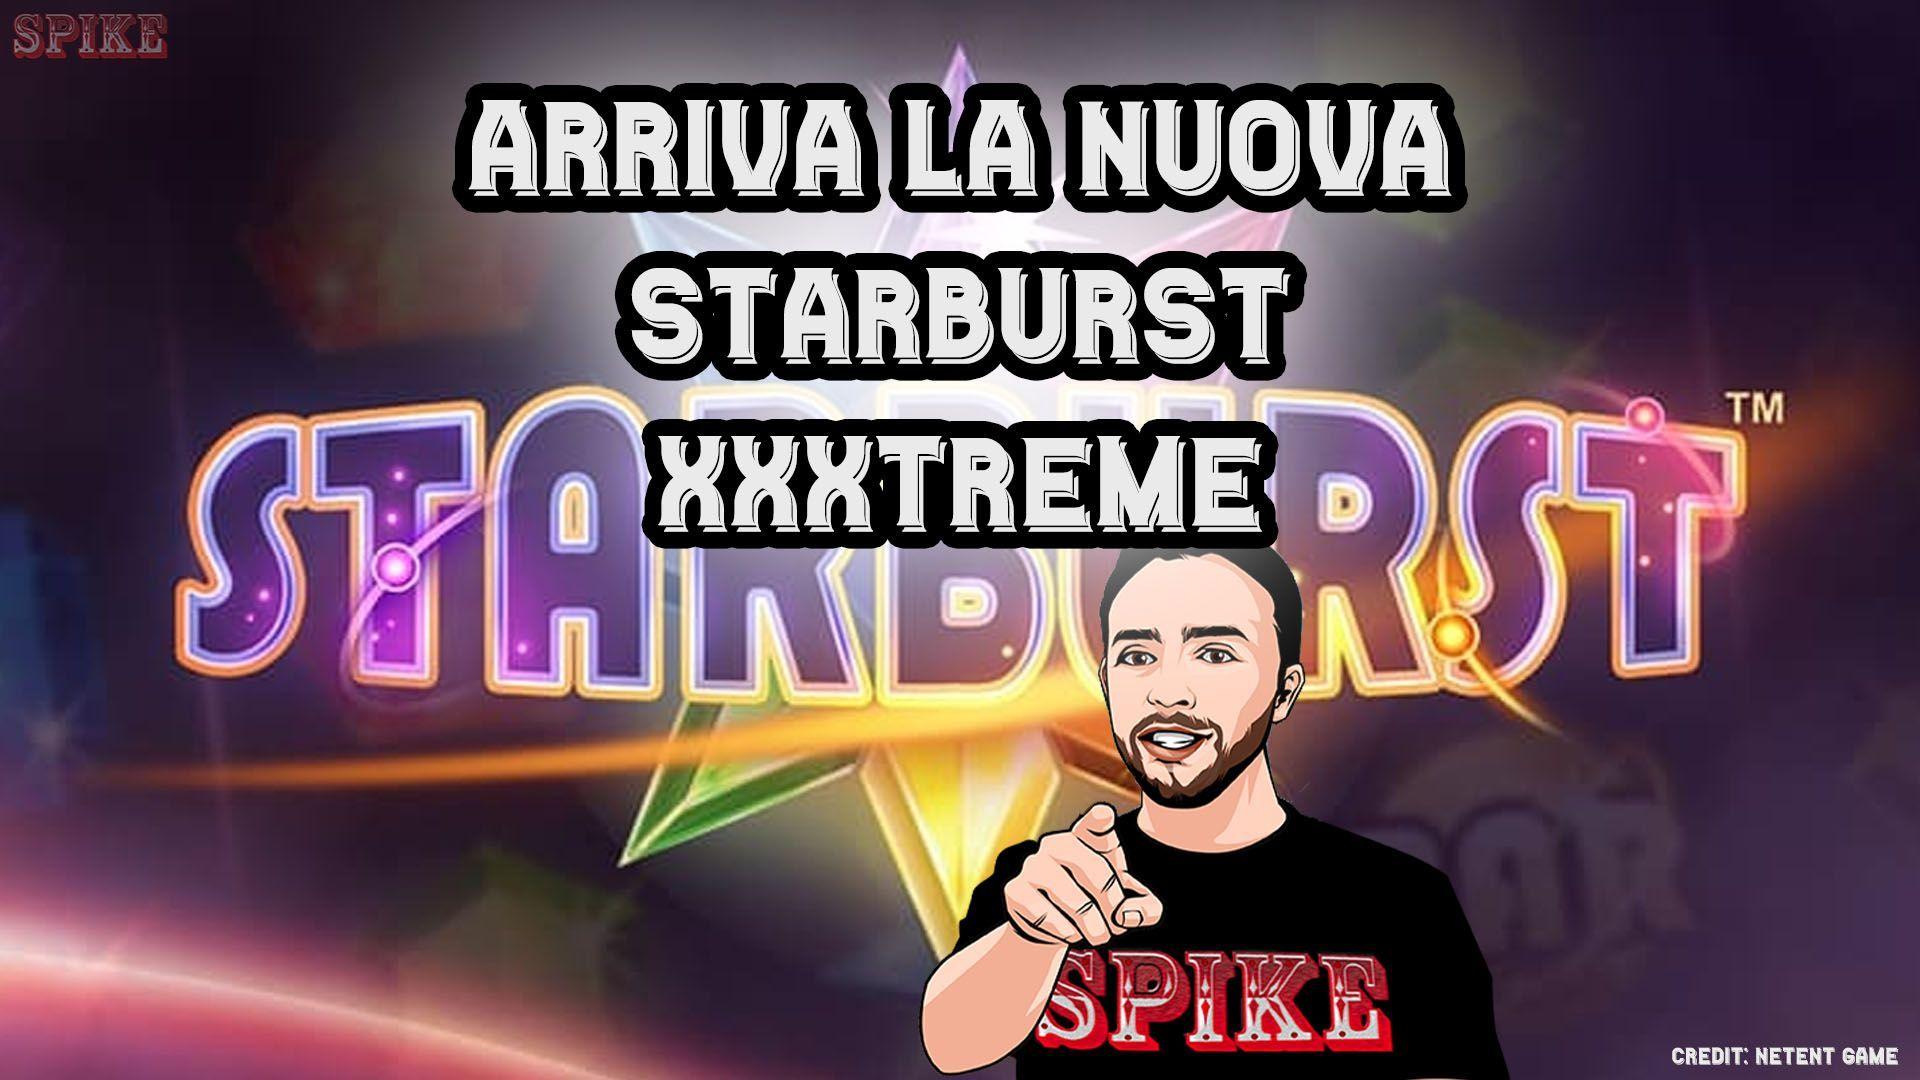 Nuova Starburst Xtreme Slot Online nei Casinò Online Credit NetEnt Game Card